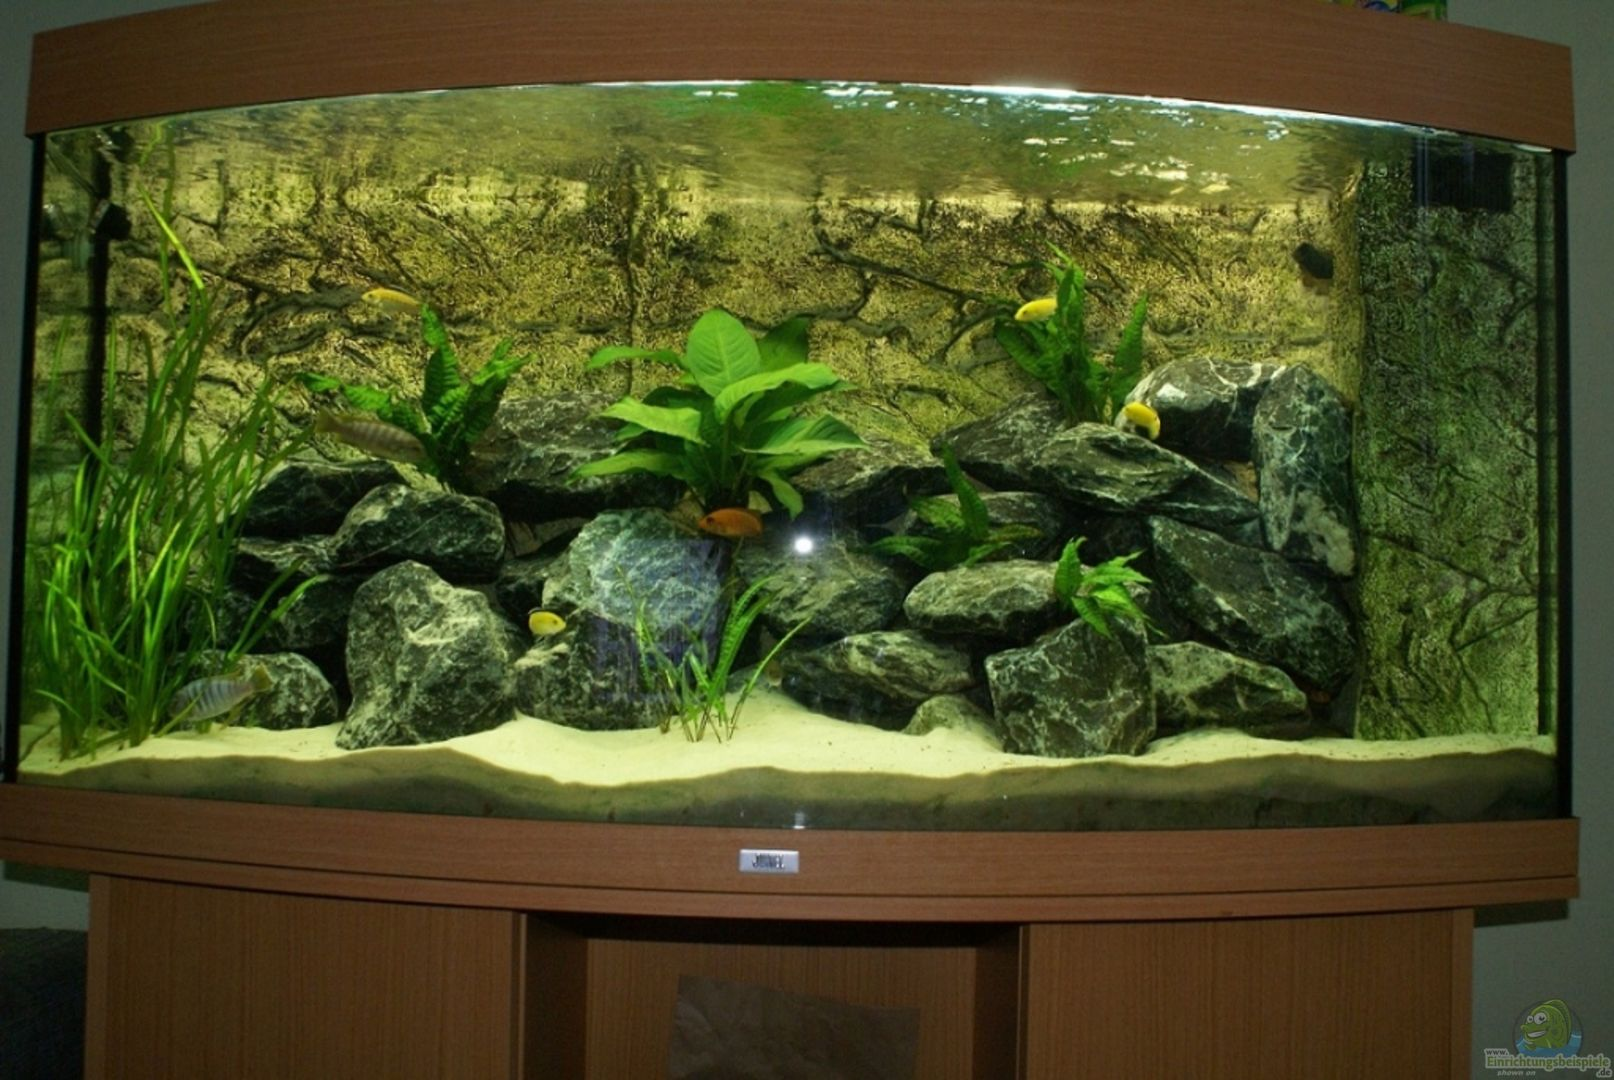 aquarium von onno83 20446 vision 260 malawi. Black Bedroom Furniture Sets. Home Design Ideas